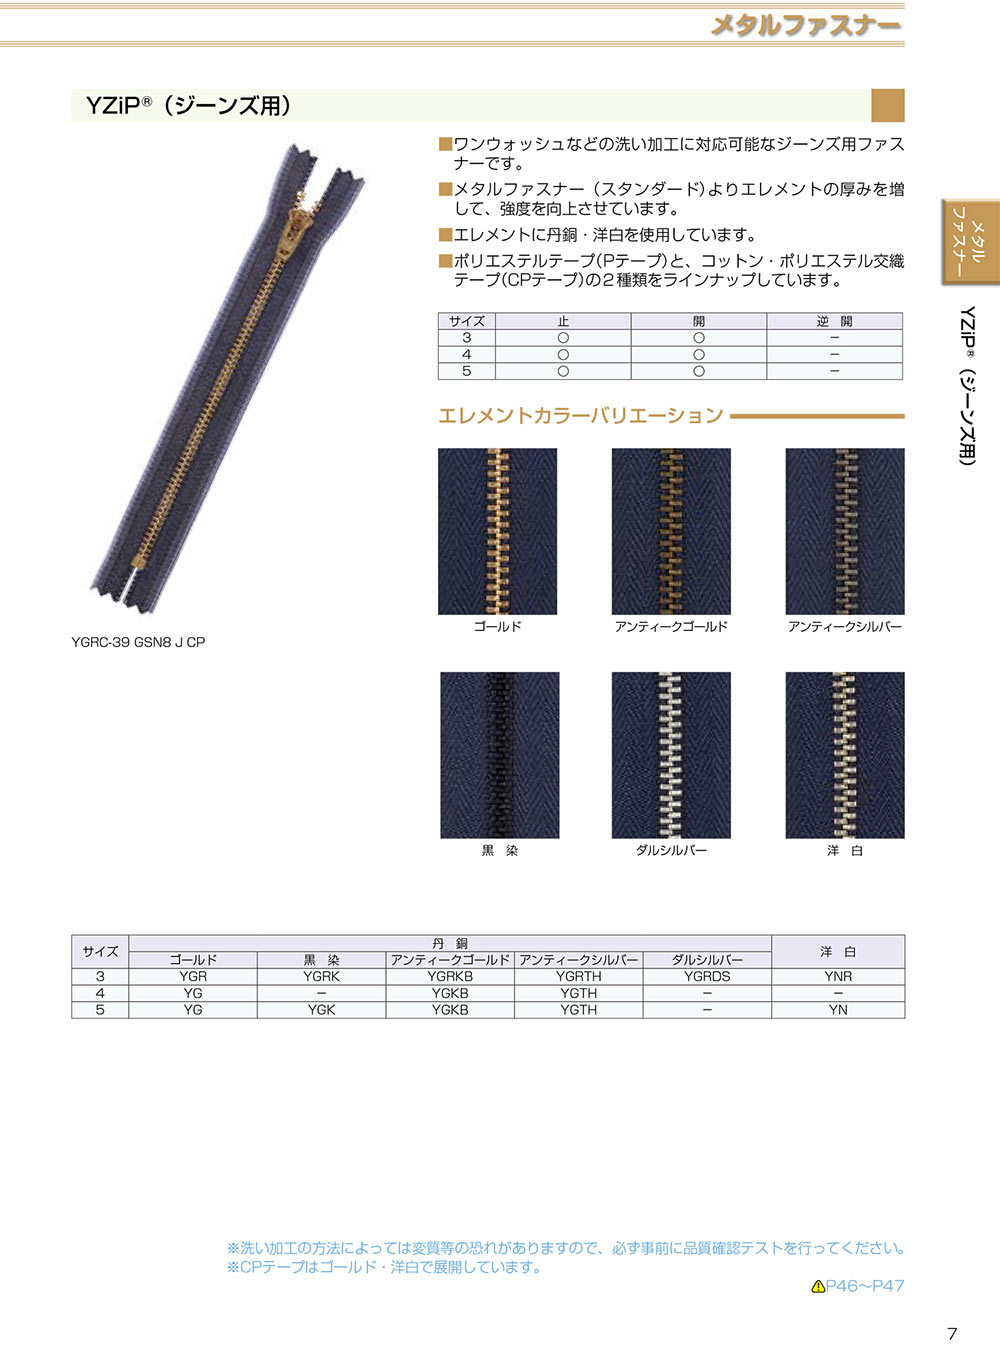 3YGRDSC YKK YZIPワイジップ(ジーンズ用)3サイズ ダルシルバー クローズ[ファスナー] YKK/オークラ商事 - ApparelX アパレル資材卸通販